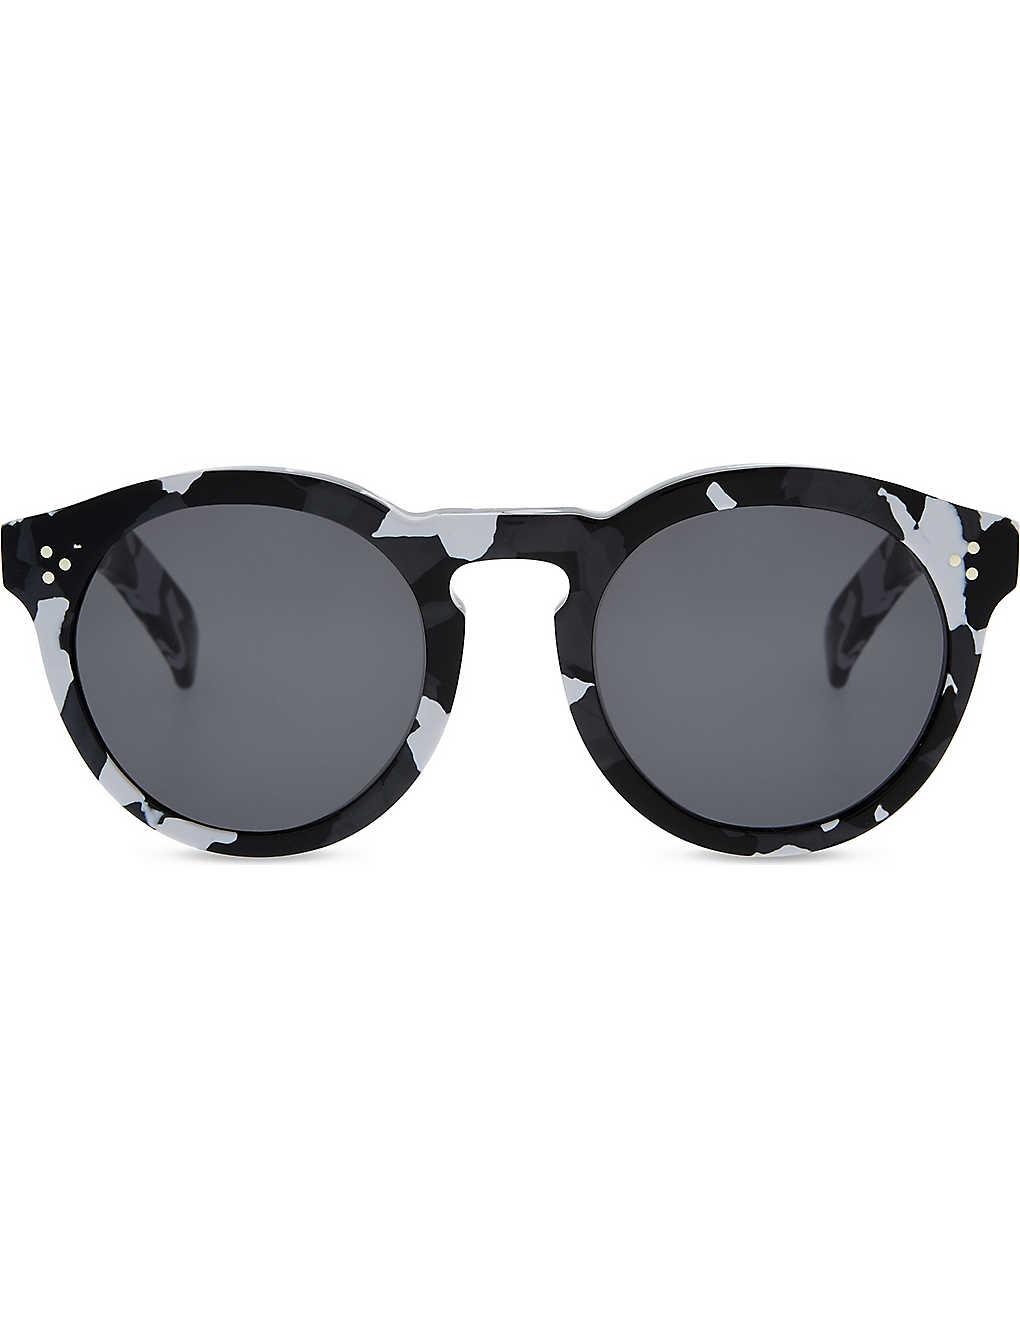 aa3e5ee719 ILLESTEVA - Leonard II round-frame sunglasses